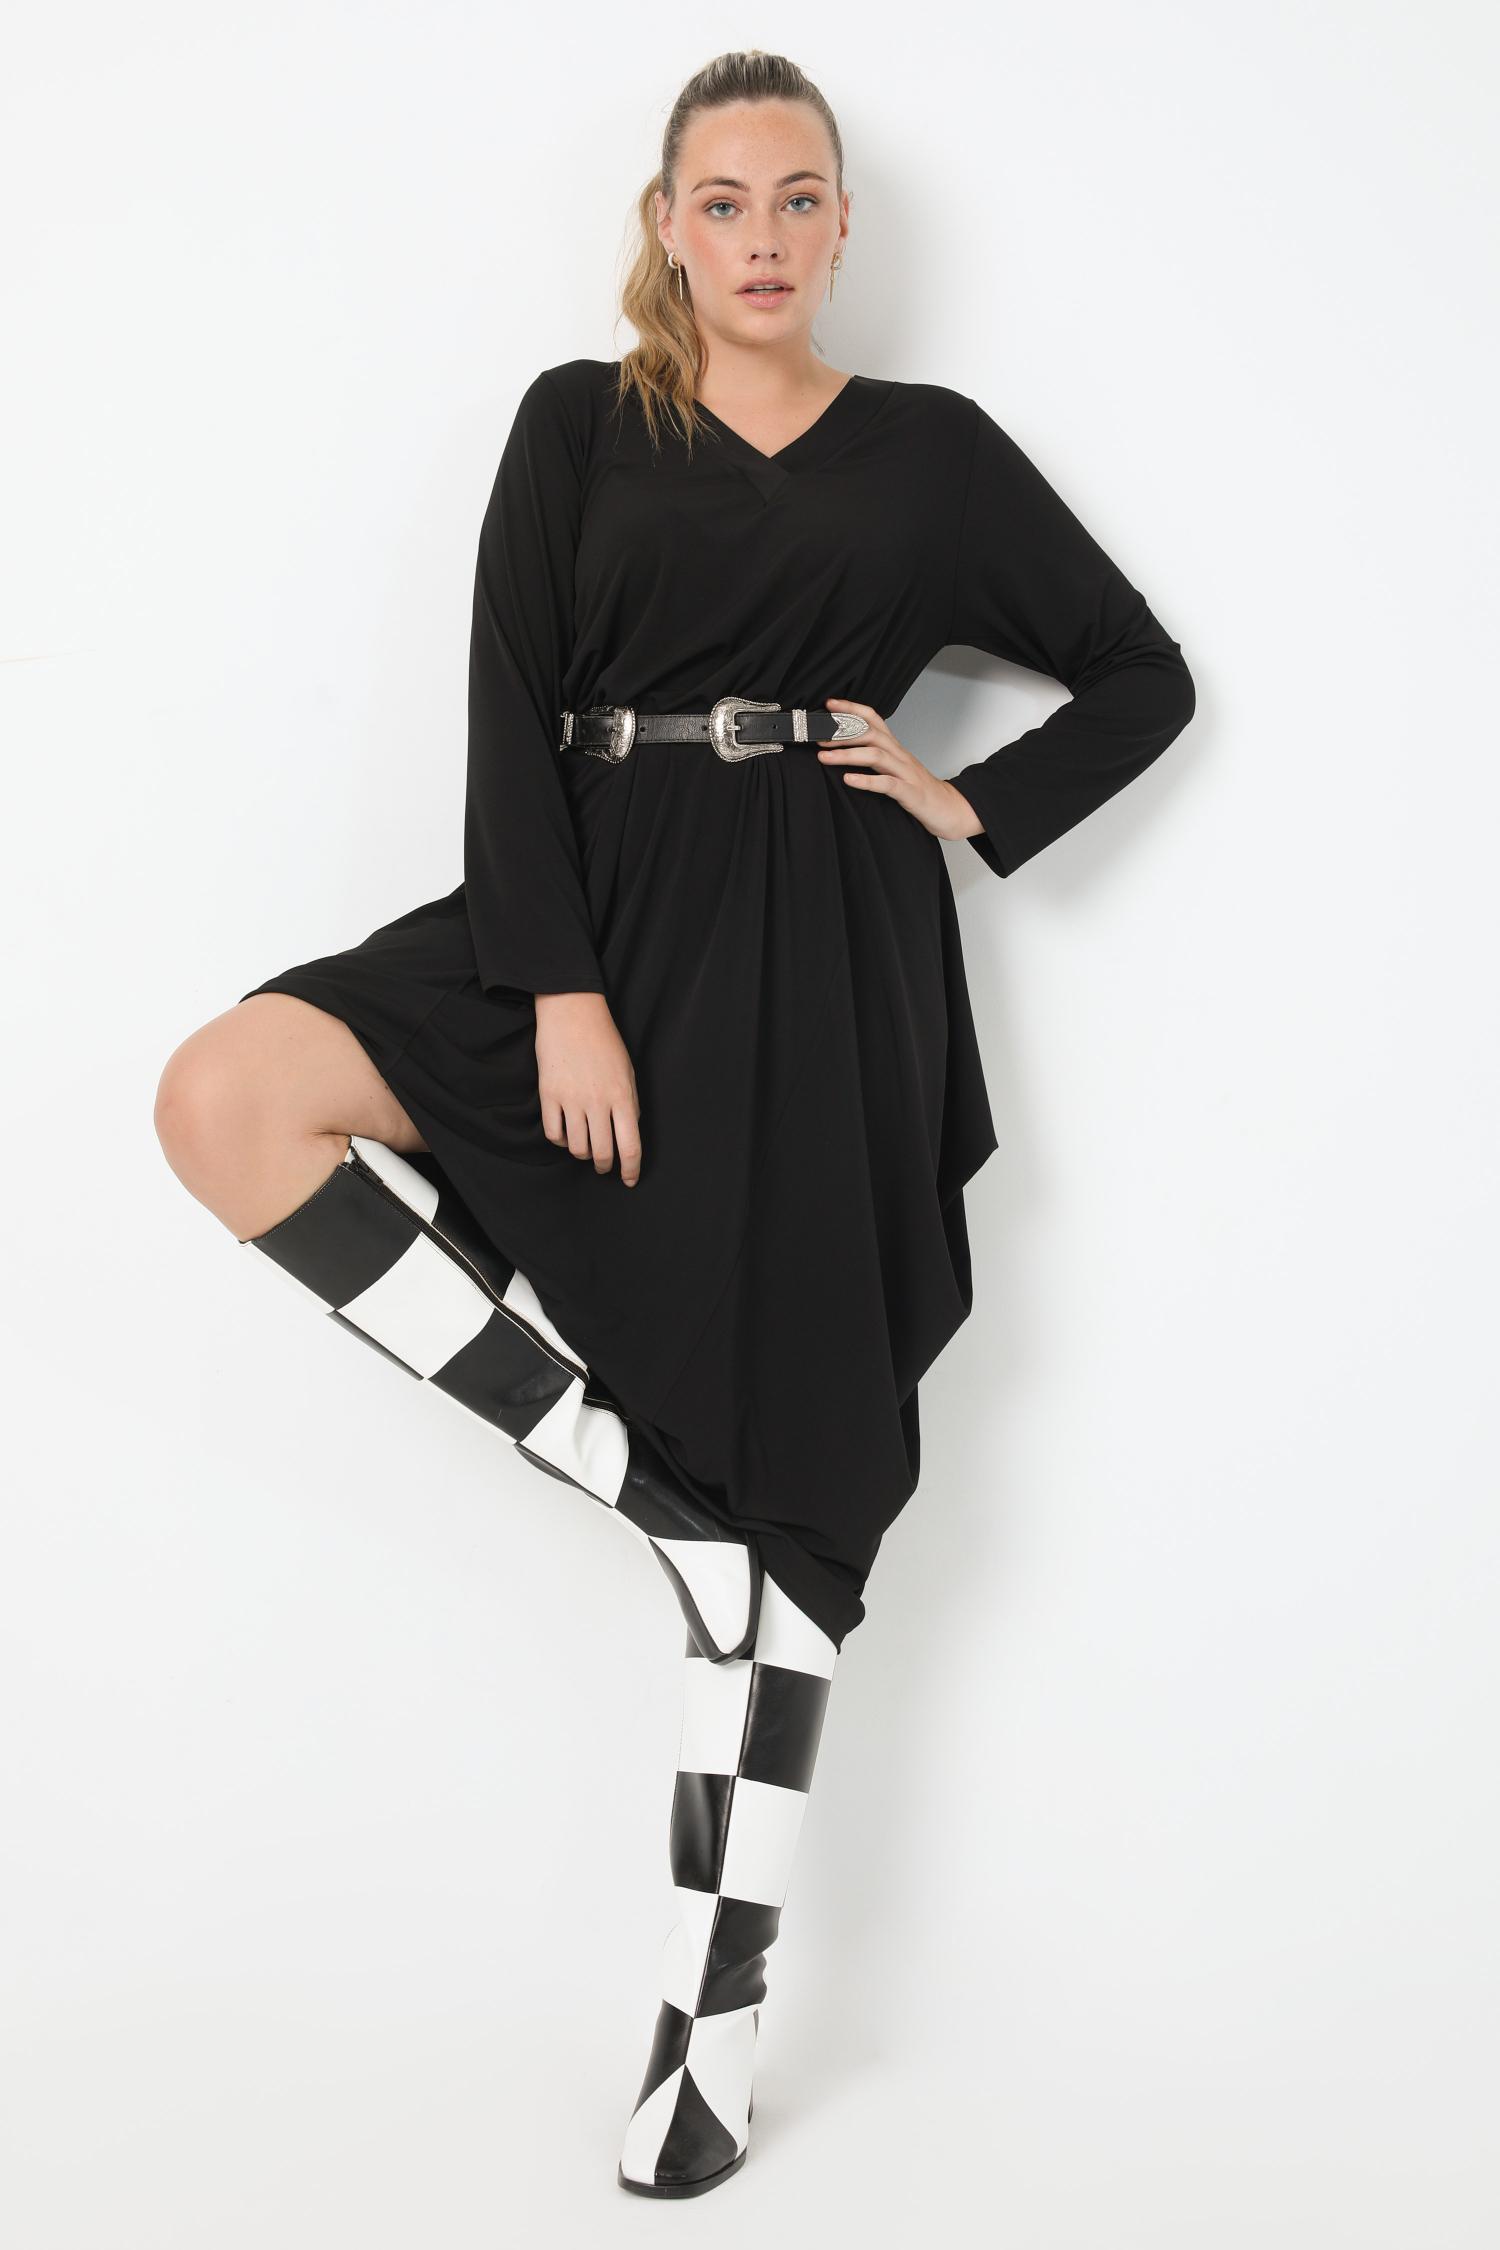 Mid-length knit dress (shipping October 5/10)